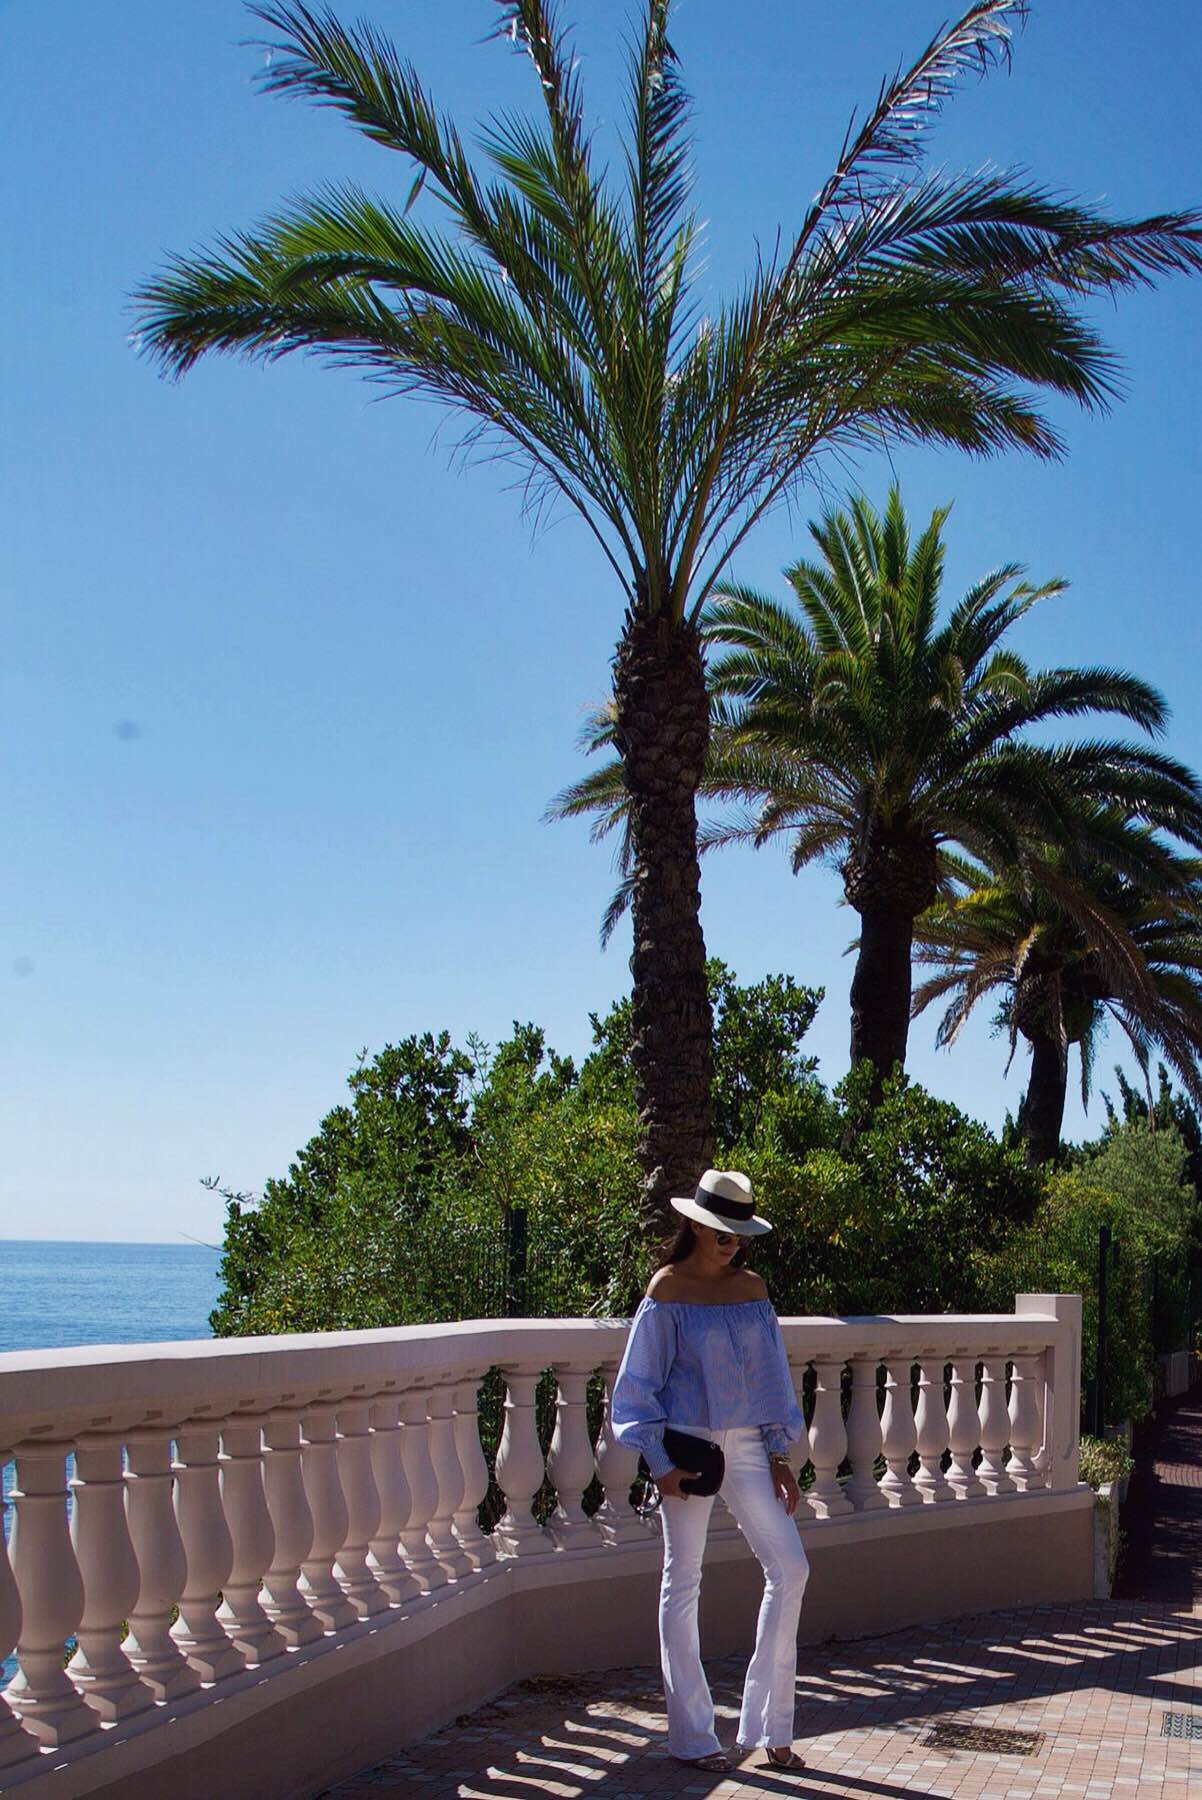 07-Tiara-Miramar-Beach-Hotel-Spa-Cote-dAzur-Yllka-Brada-Collaboration-Disi-Couture